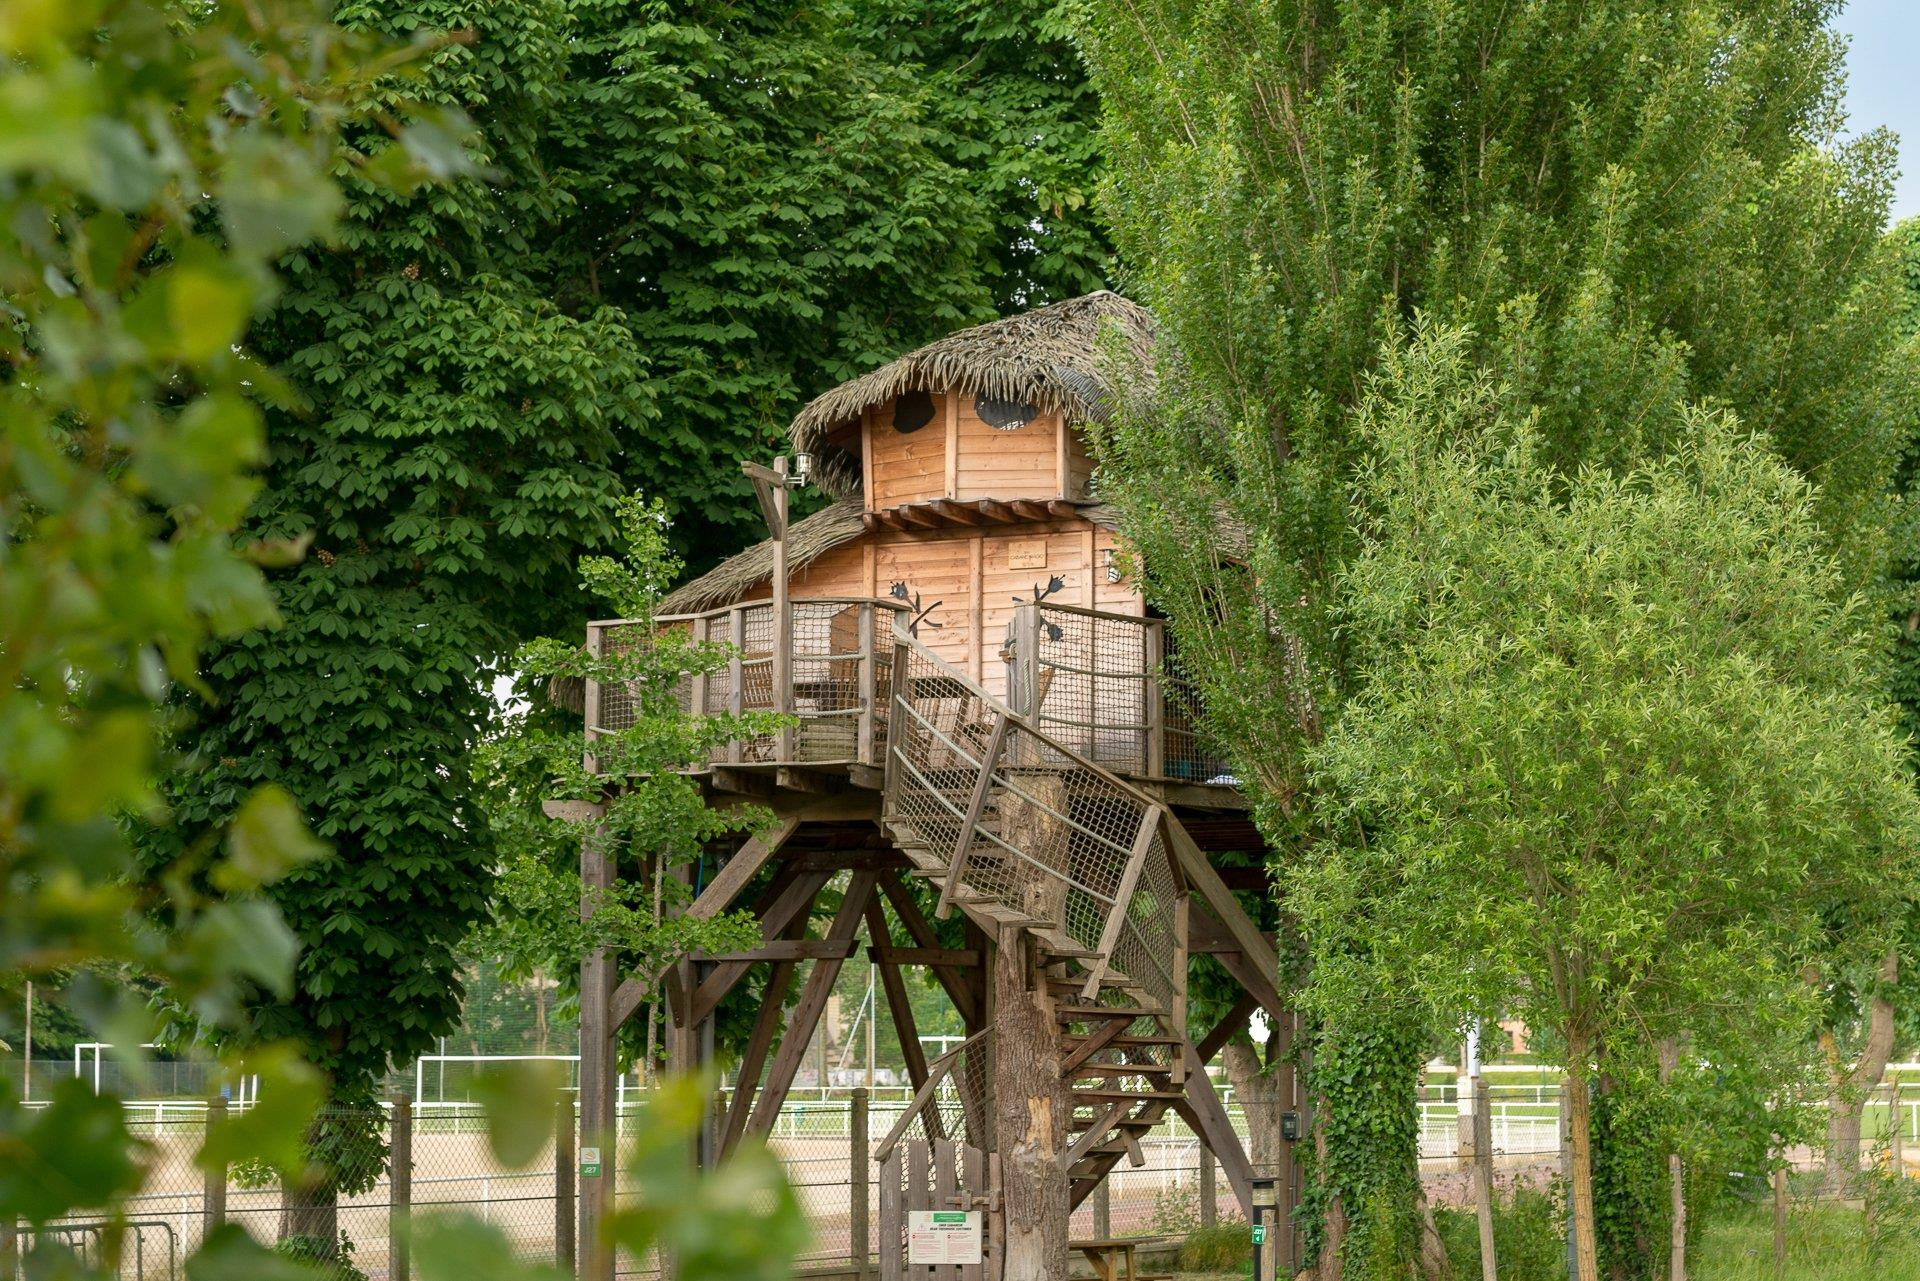 Location - Cabane Magic 2 Chambres - Camping Sandaya Paris Maisons-Laffitte